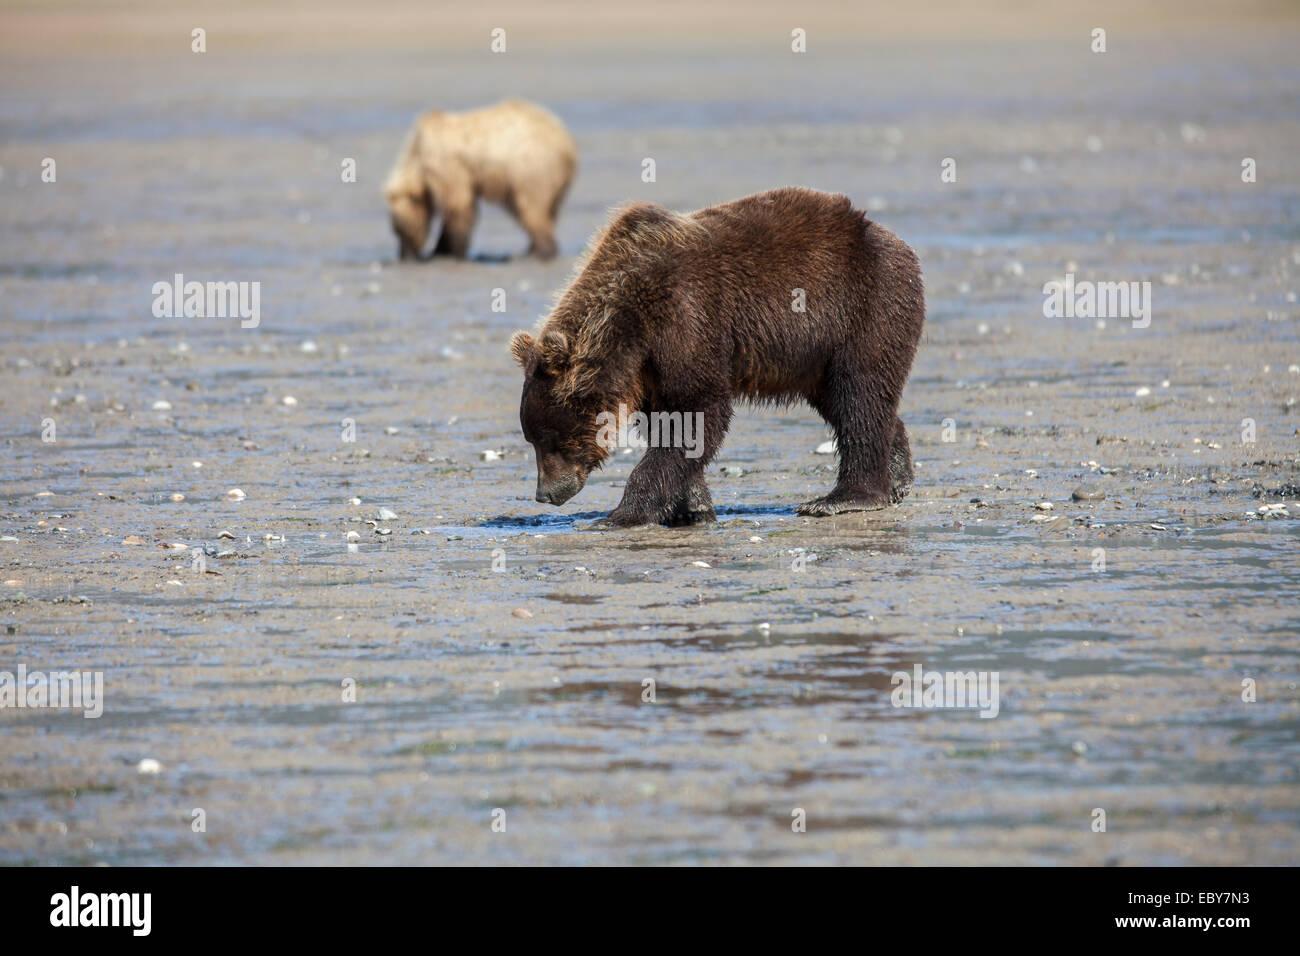 Coastal Brown bear in Chinitna Bay, Kenai Peninsula Borough, Alaska, USA Stock Photo